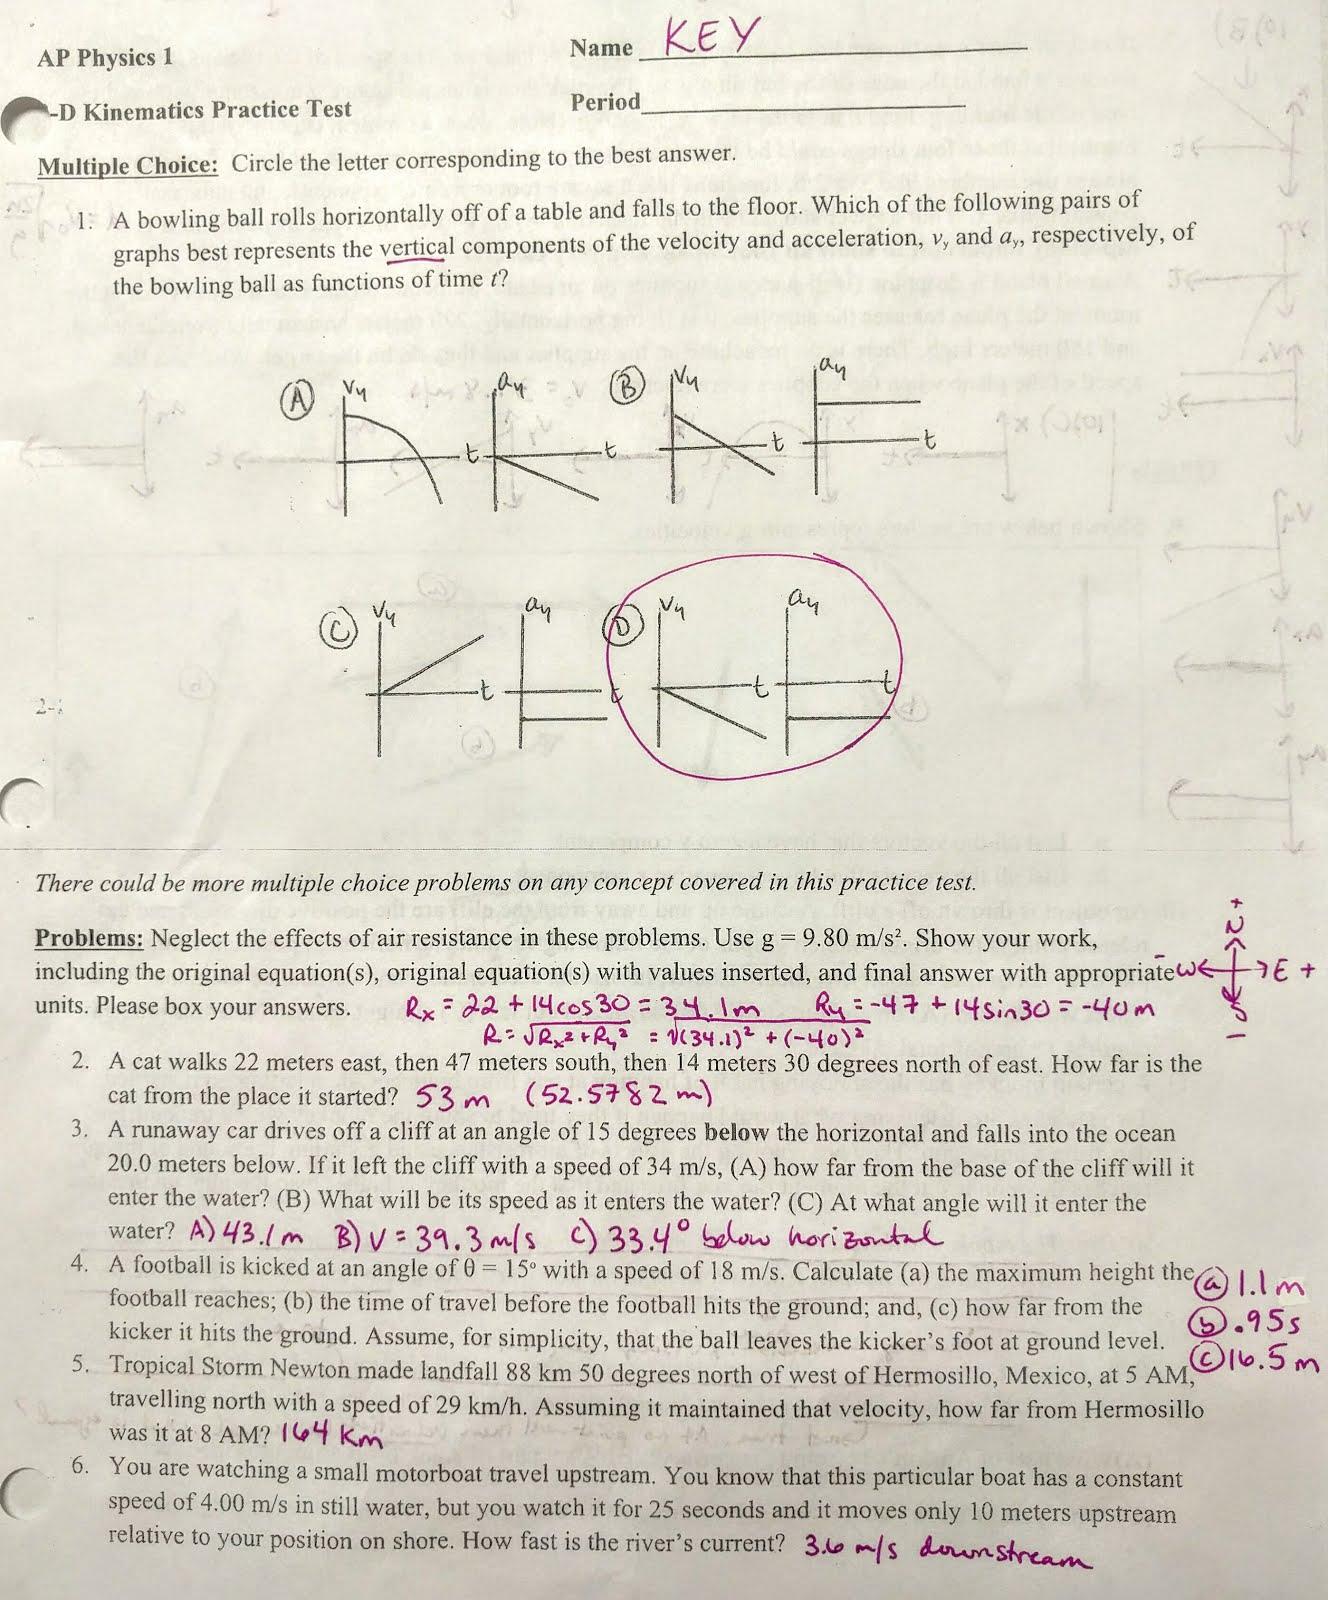 Volkening S Physics Classes 2 D Kinematics Test Practice